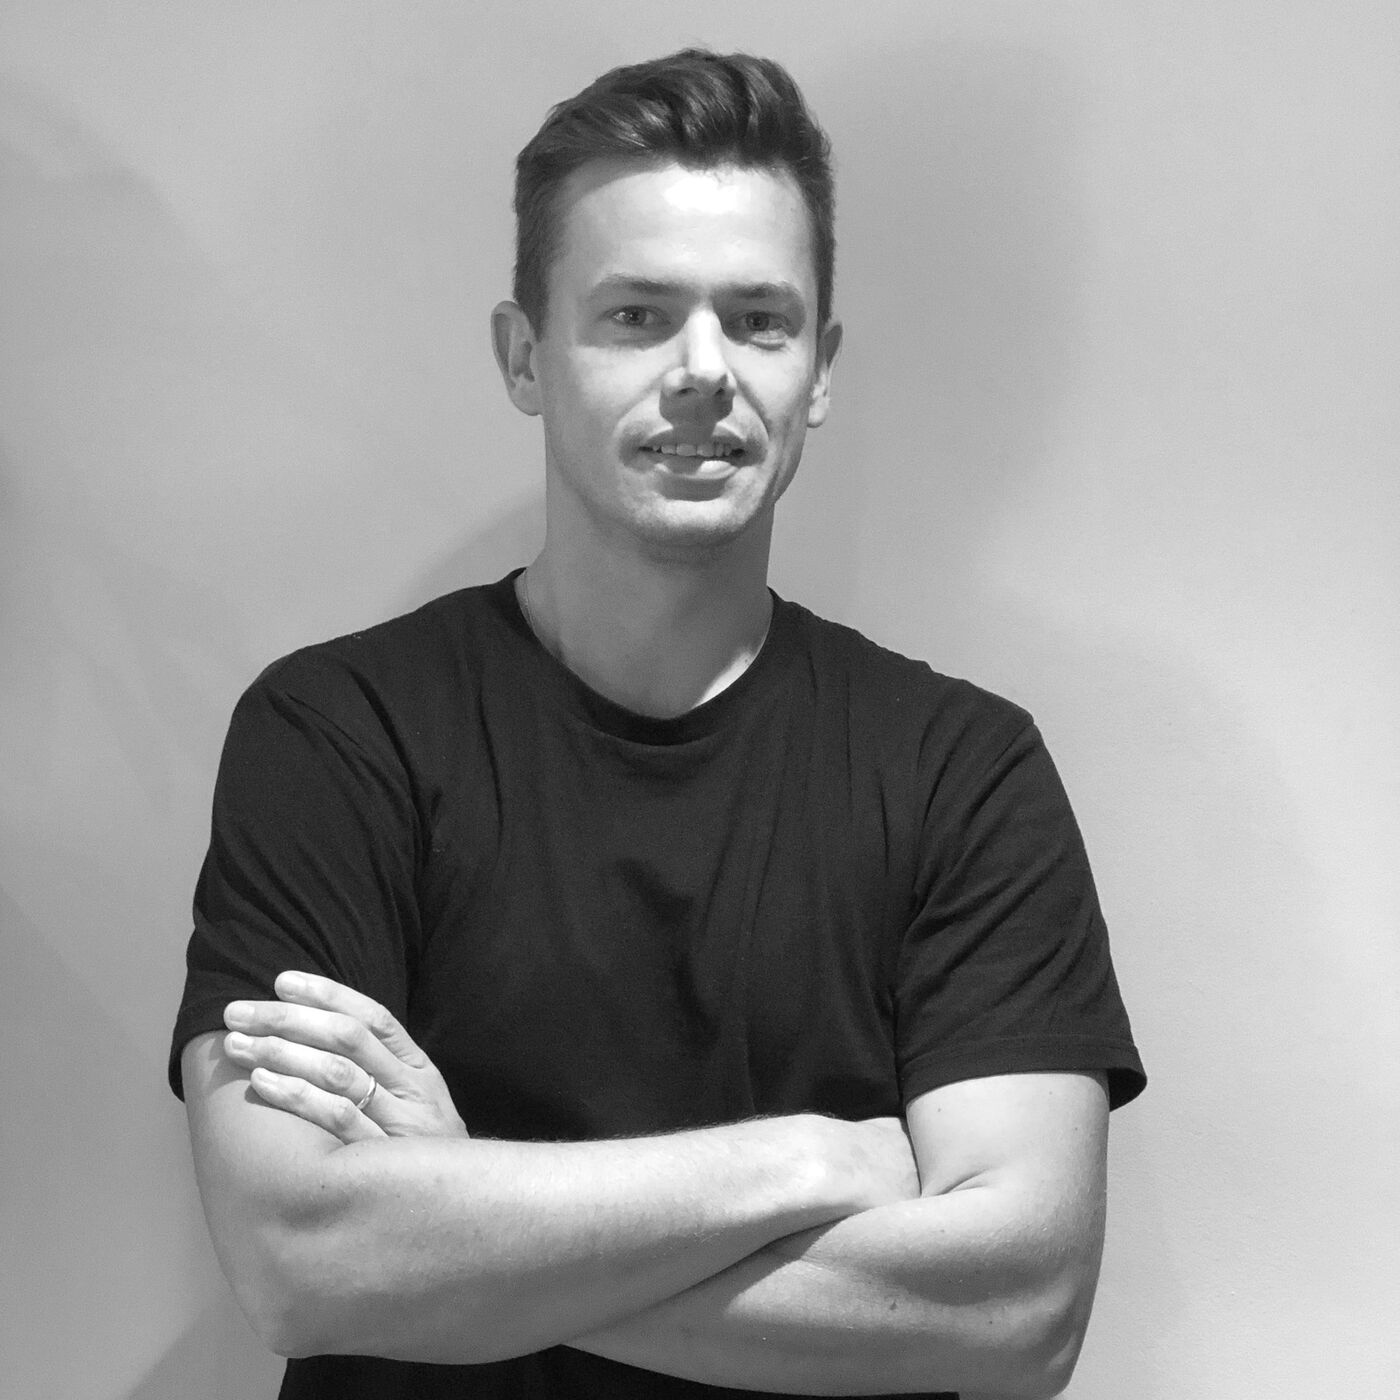 Kristian Lorenzon, Co-Founder of Heist